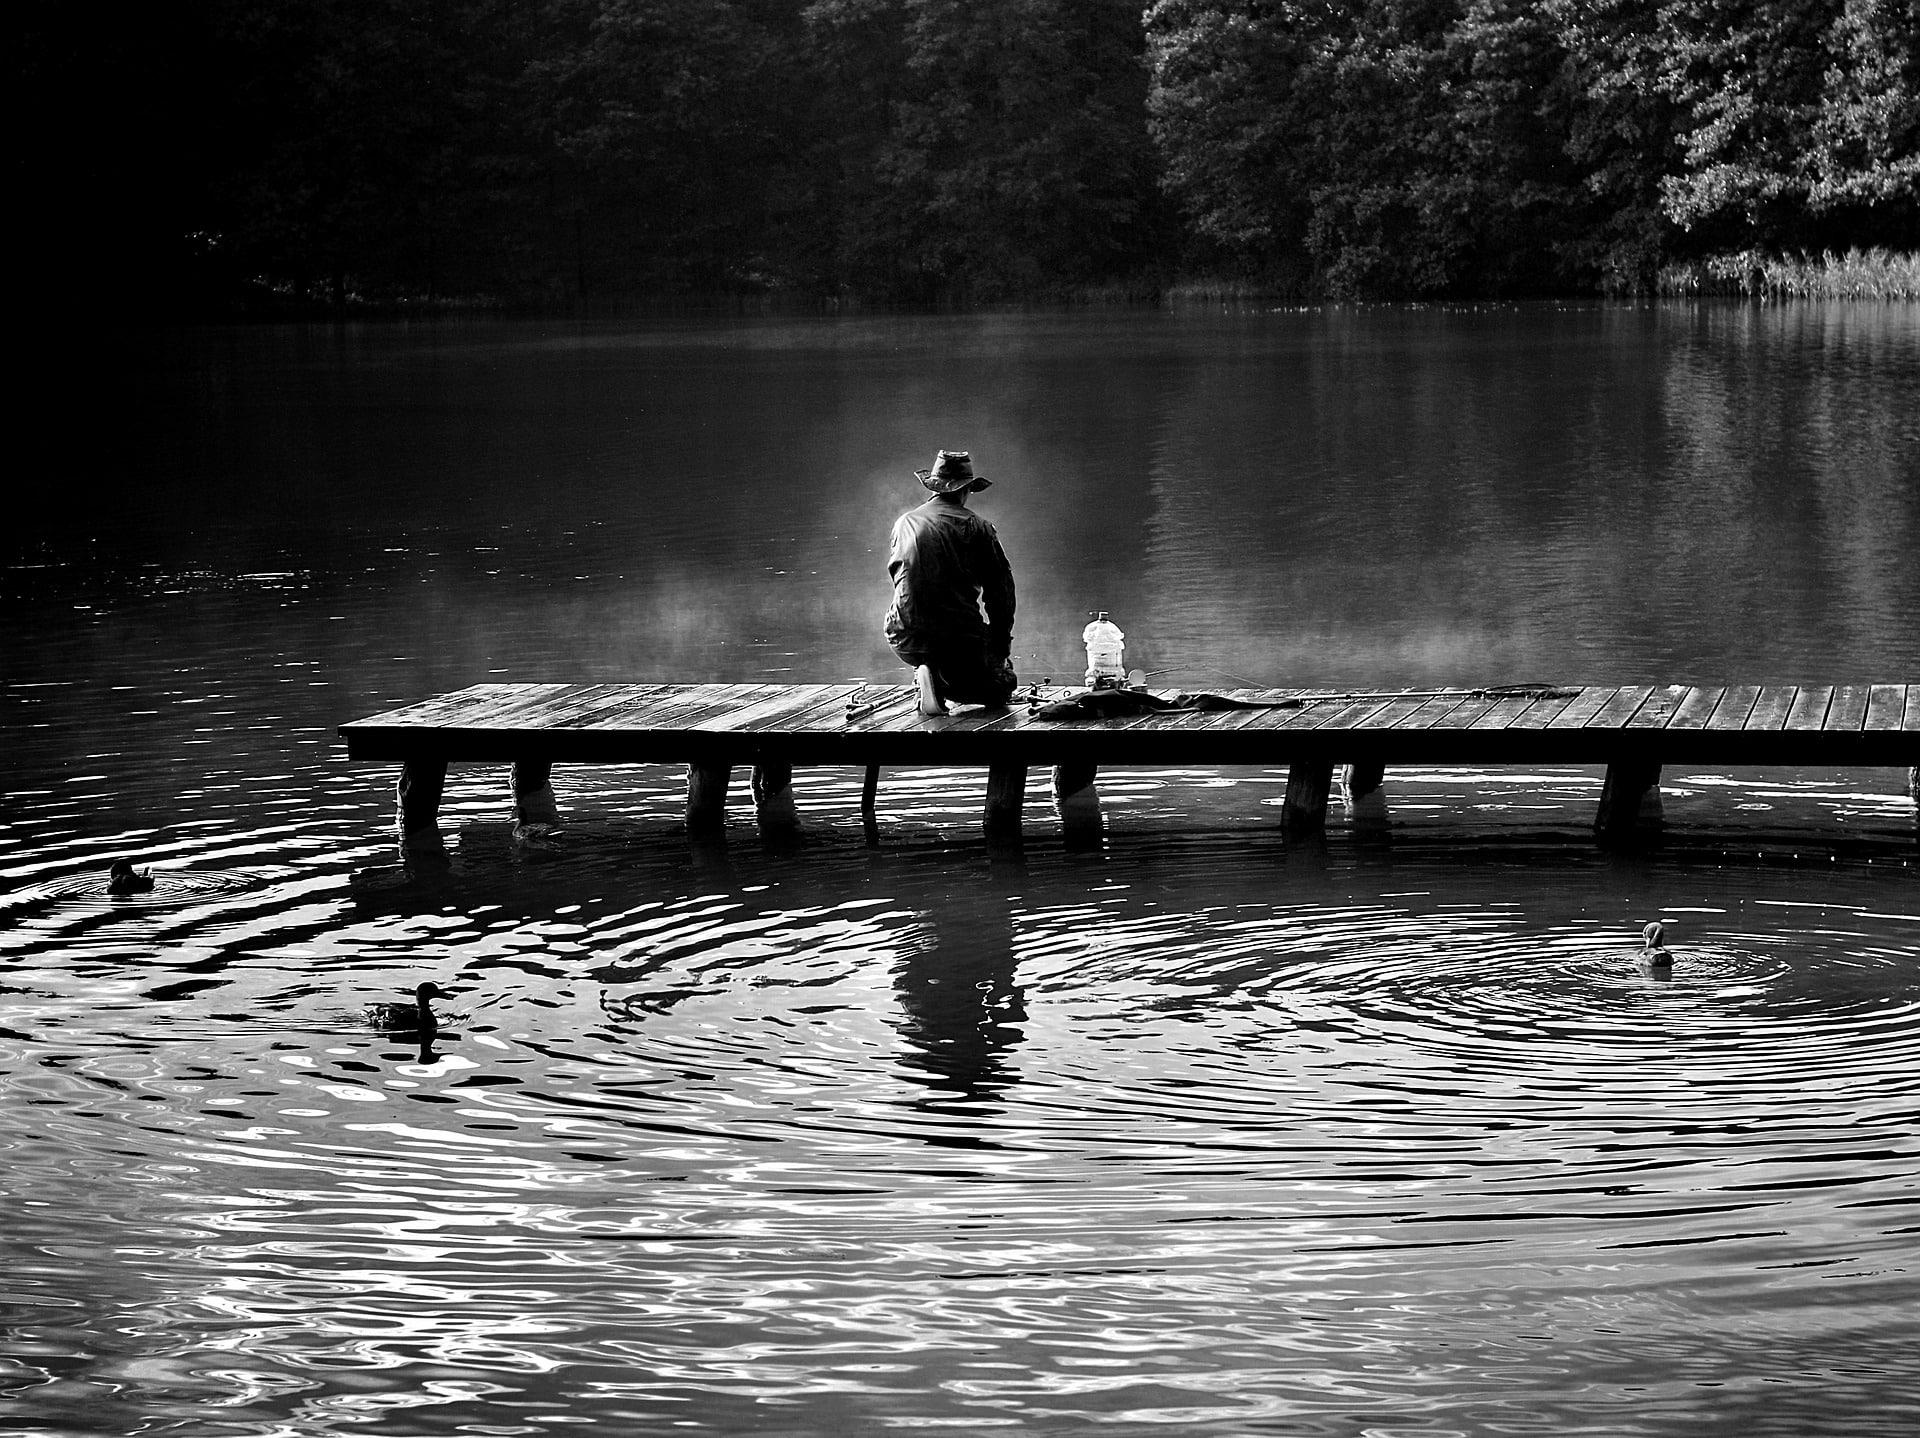 Angelschein Buxtehude - Angler in sw